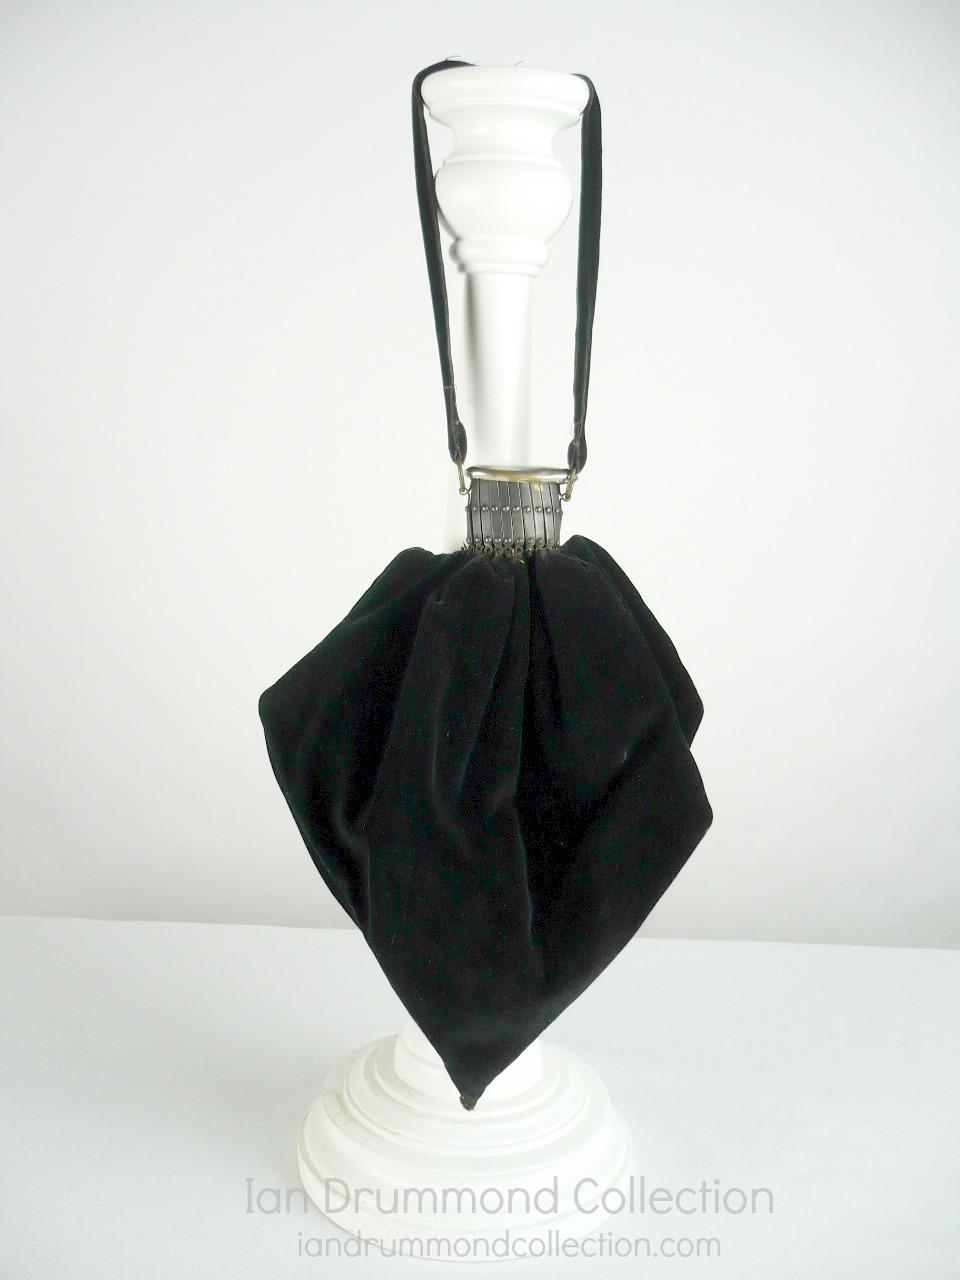 Ian Drummond Collection TV Movie Vintage Clothing Wardrobe Rental Toronto 1920s purse 4 (1)